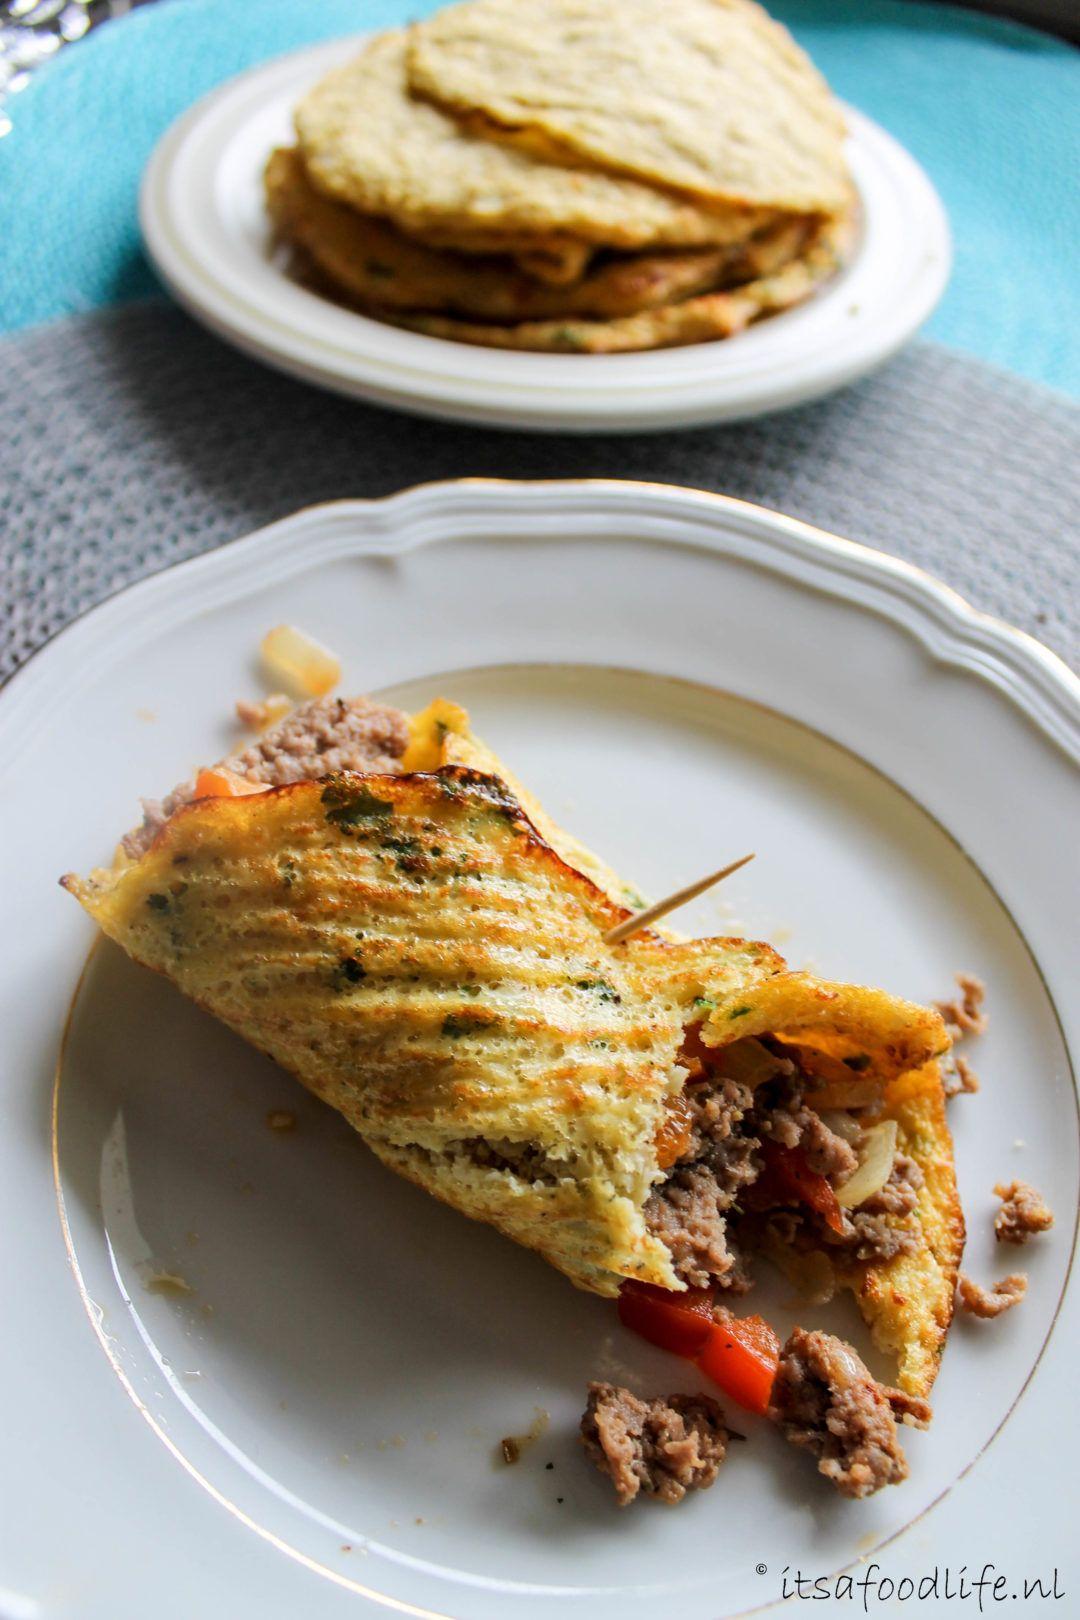 Bloemkool tortilla met pittig gekruid gehakt - It's a food life